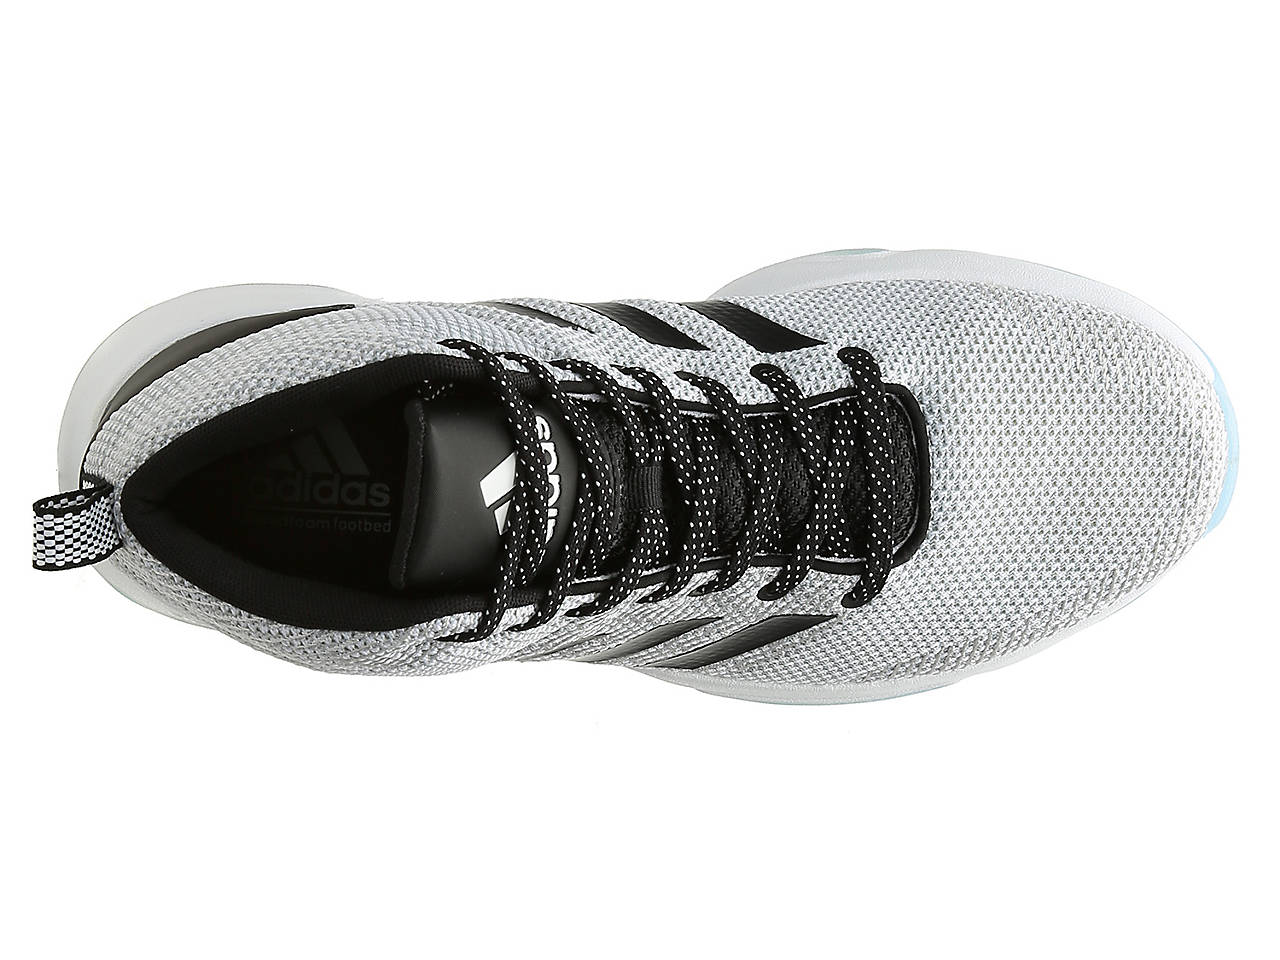 fad08be3a70 adidas Cloudfoam Ignition Basketball Shoe - Men s Men s Shoes